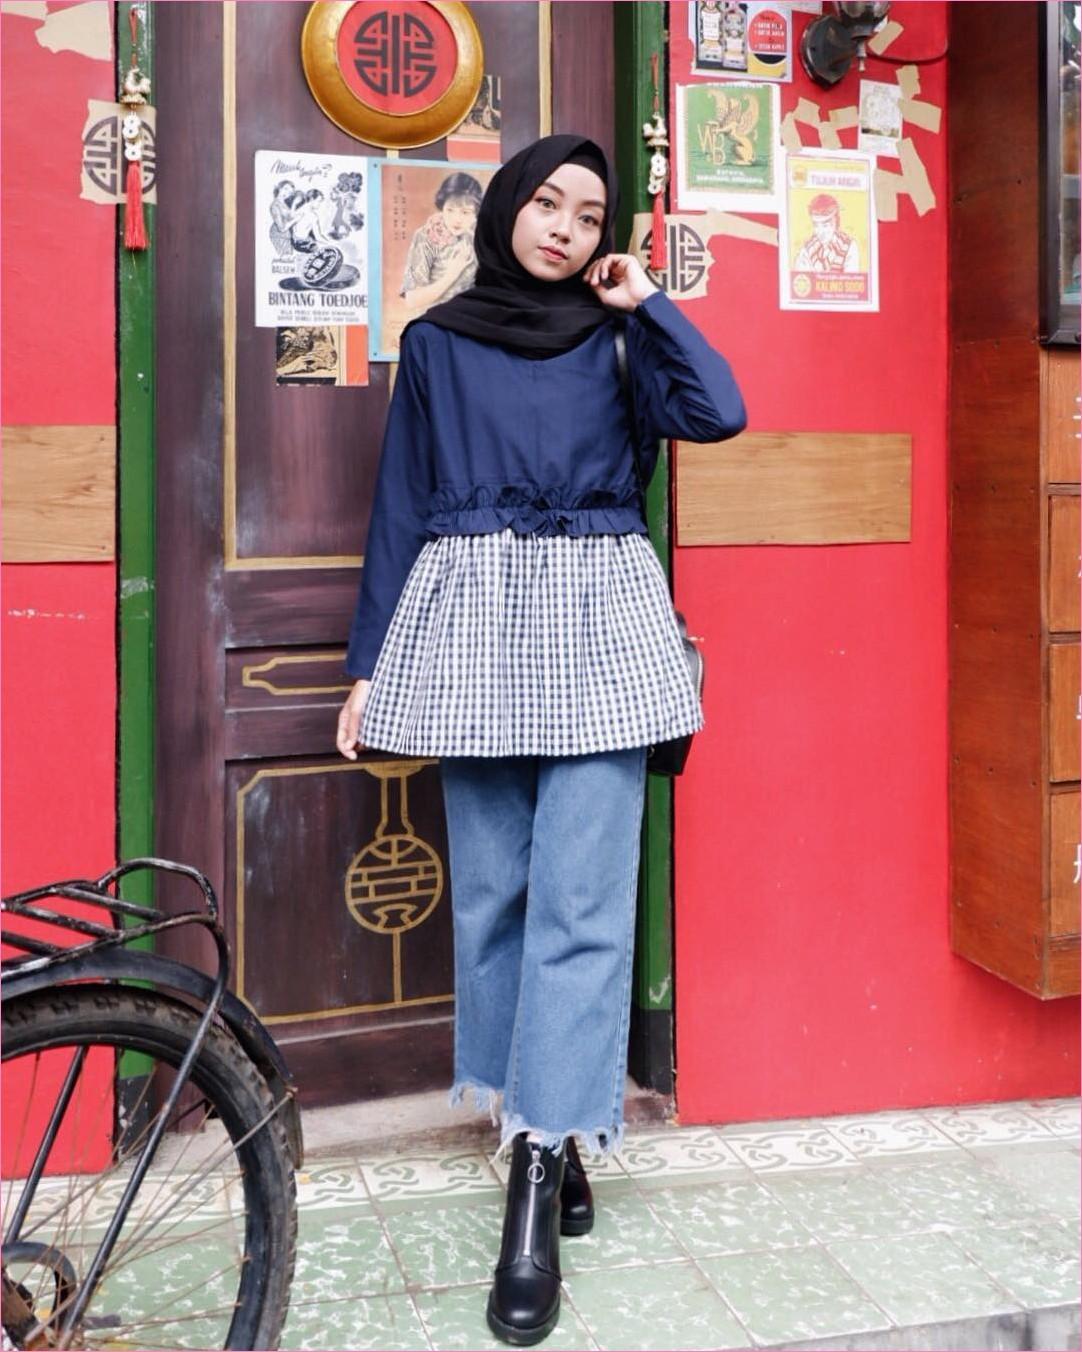 Outfit Baju Top  Blouse Untuk Hijabers Ala Selebgram 2018 peplum blouse biru dongker celana pallazo cullotes jeans denim sobek ankle boots hijab pashmina diamond hitam ciput rajut slingbags ootd trendy gaya casual